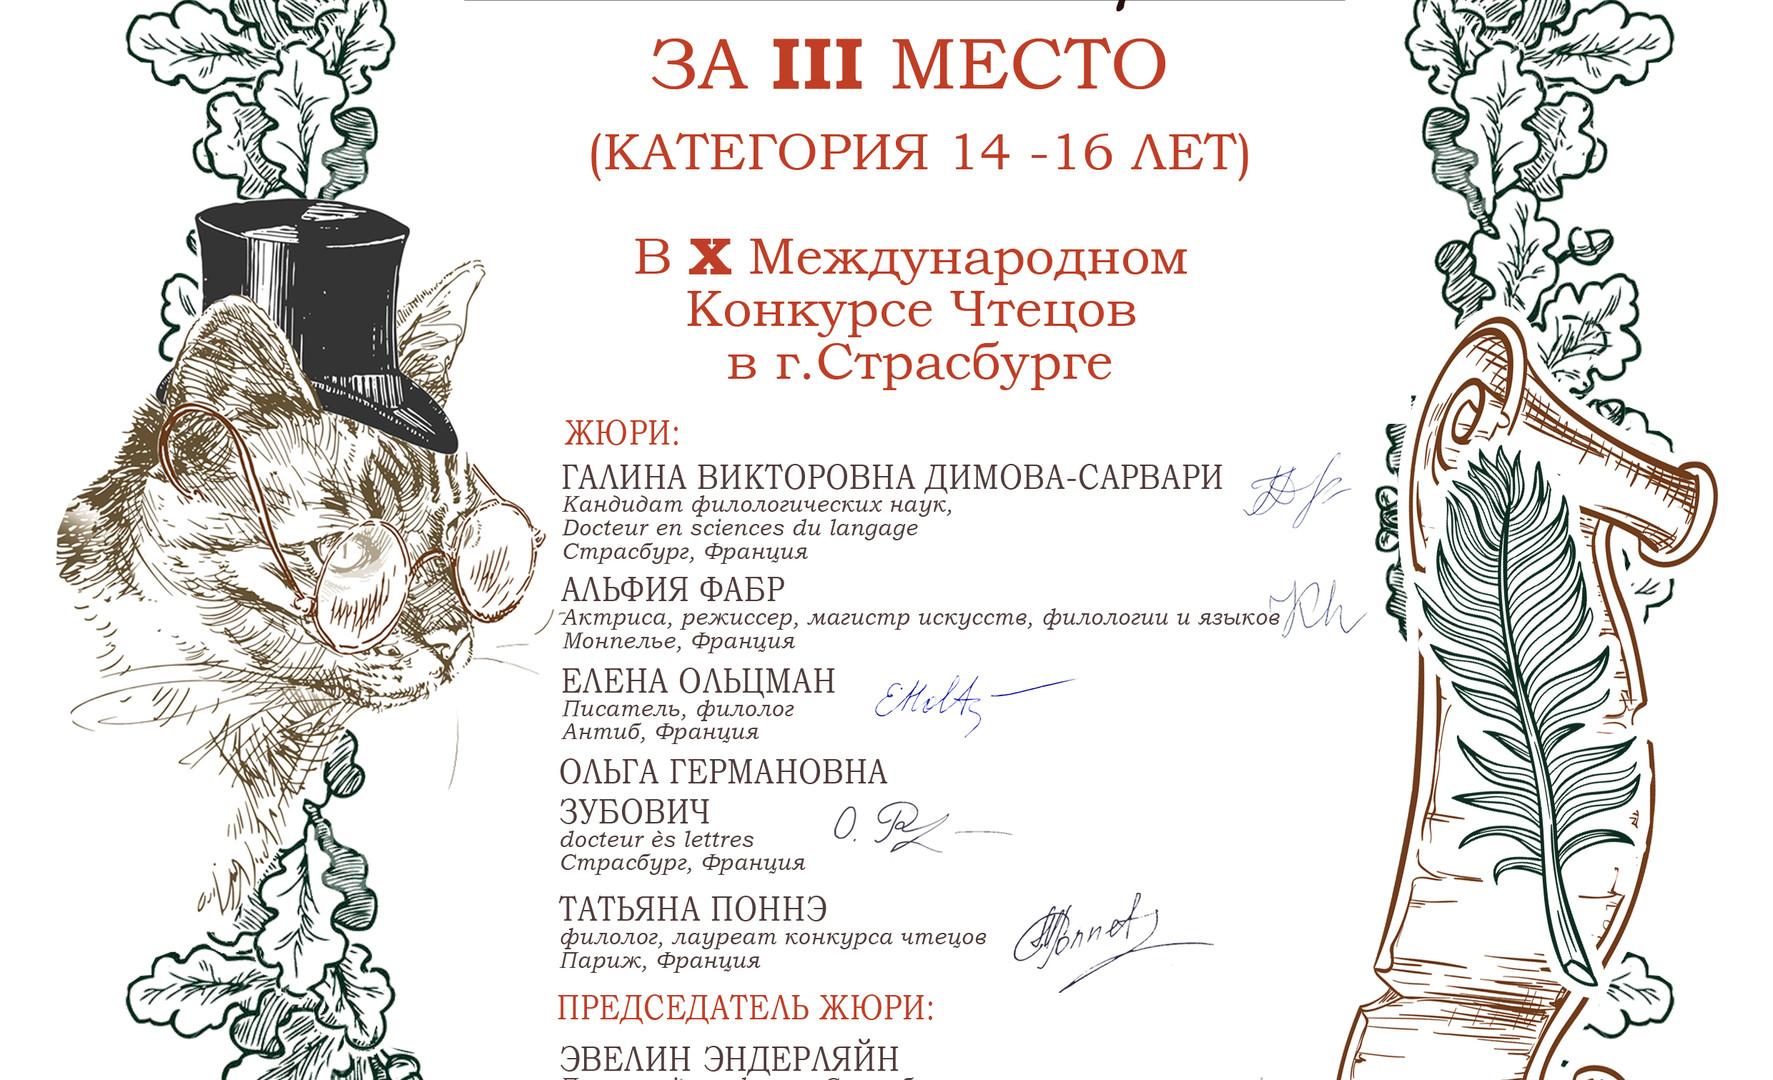 Diplom_KCH_X_3_place_14-16.jpg